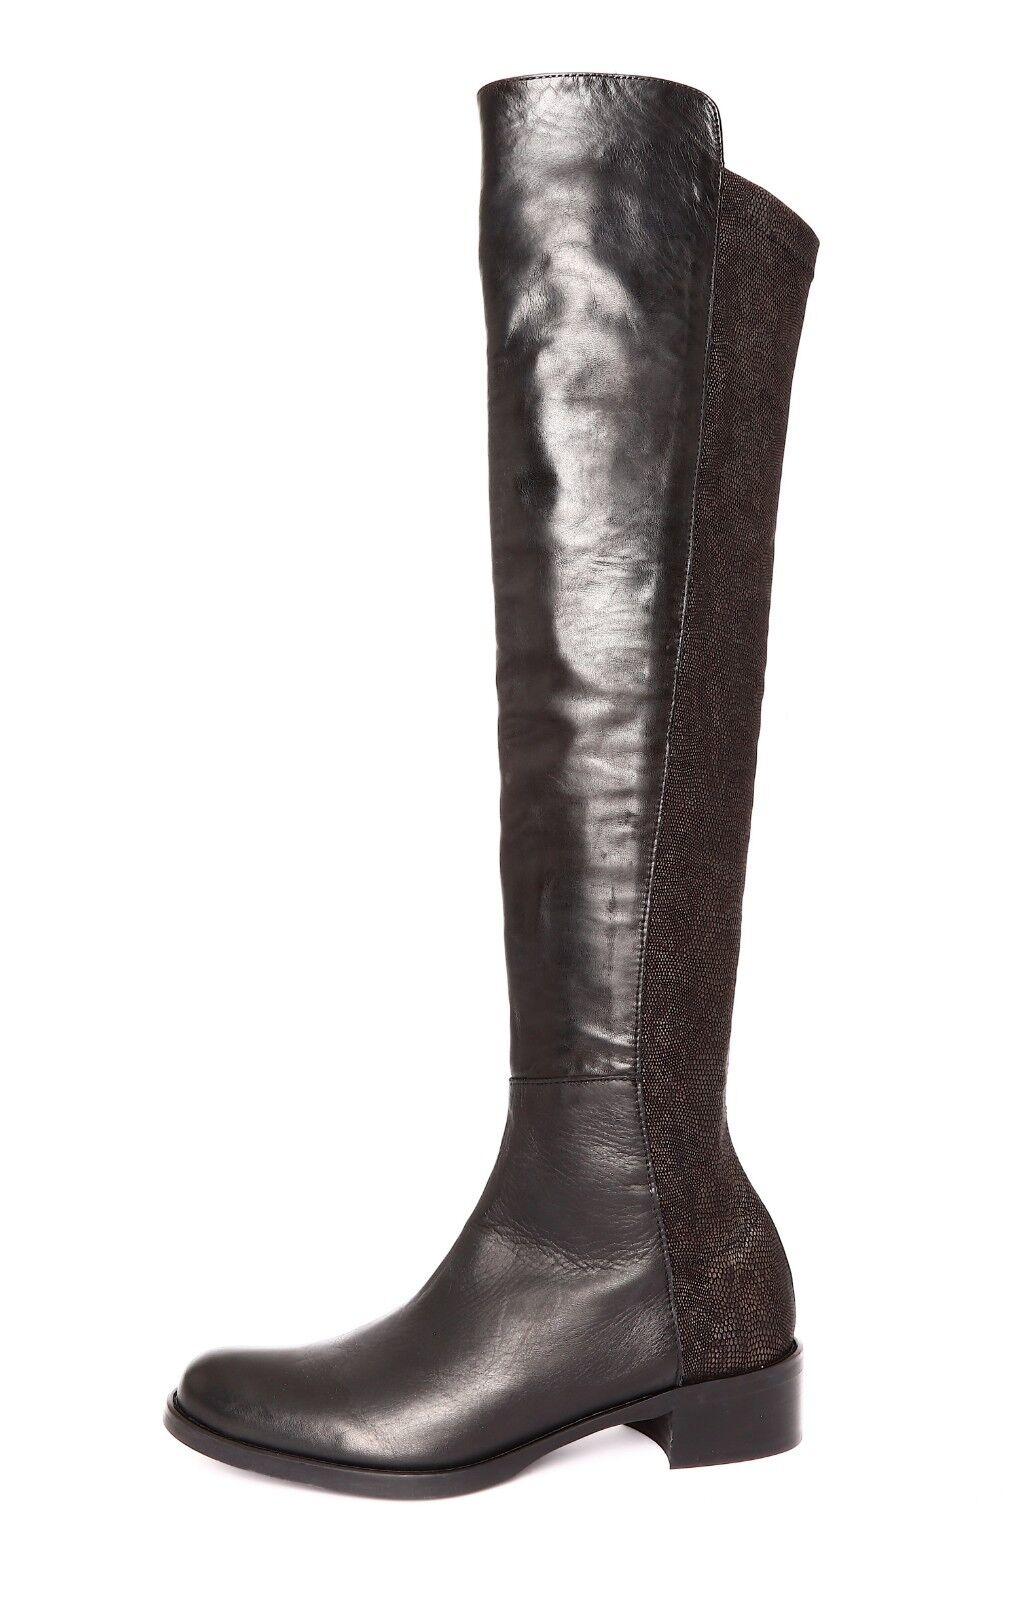 Sesto Meucci Women's Black Over The Knee Leather Boot Sz 8 3243 *